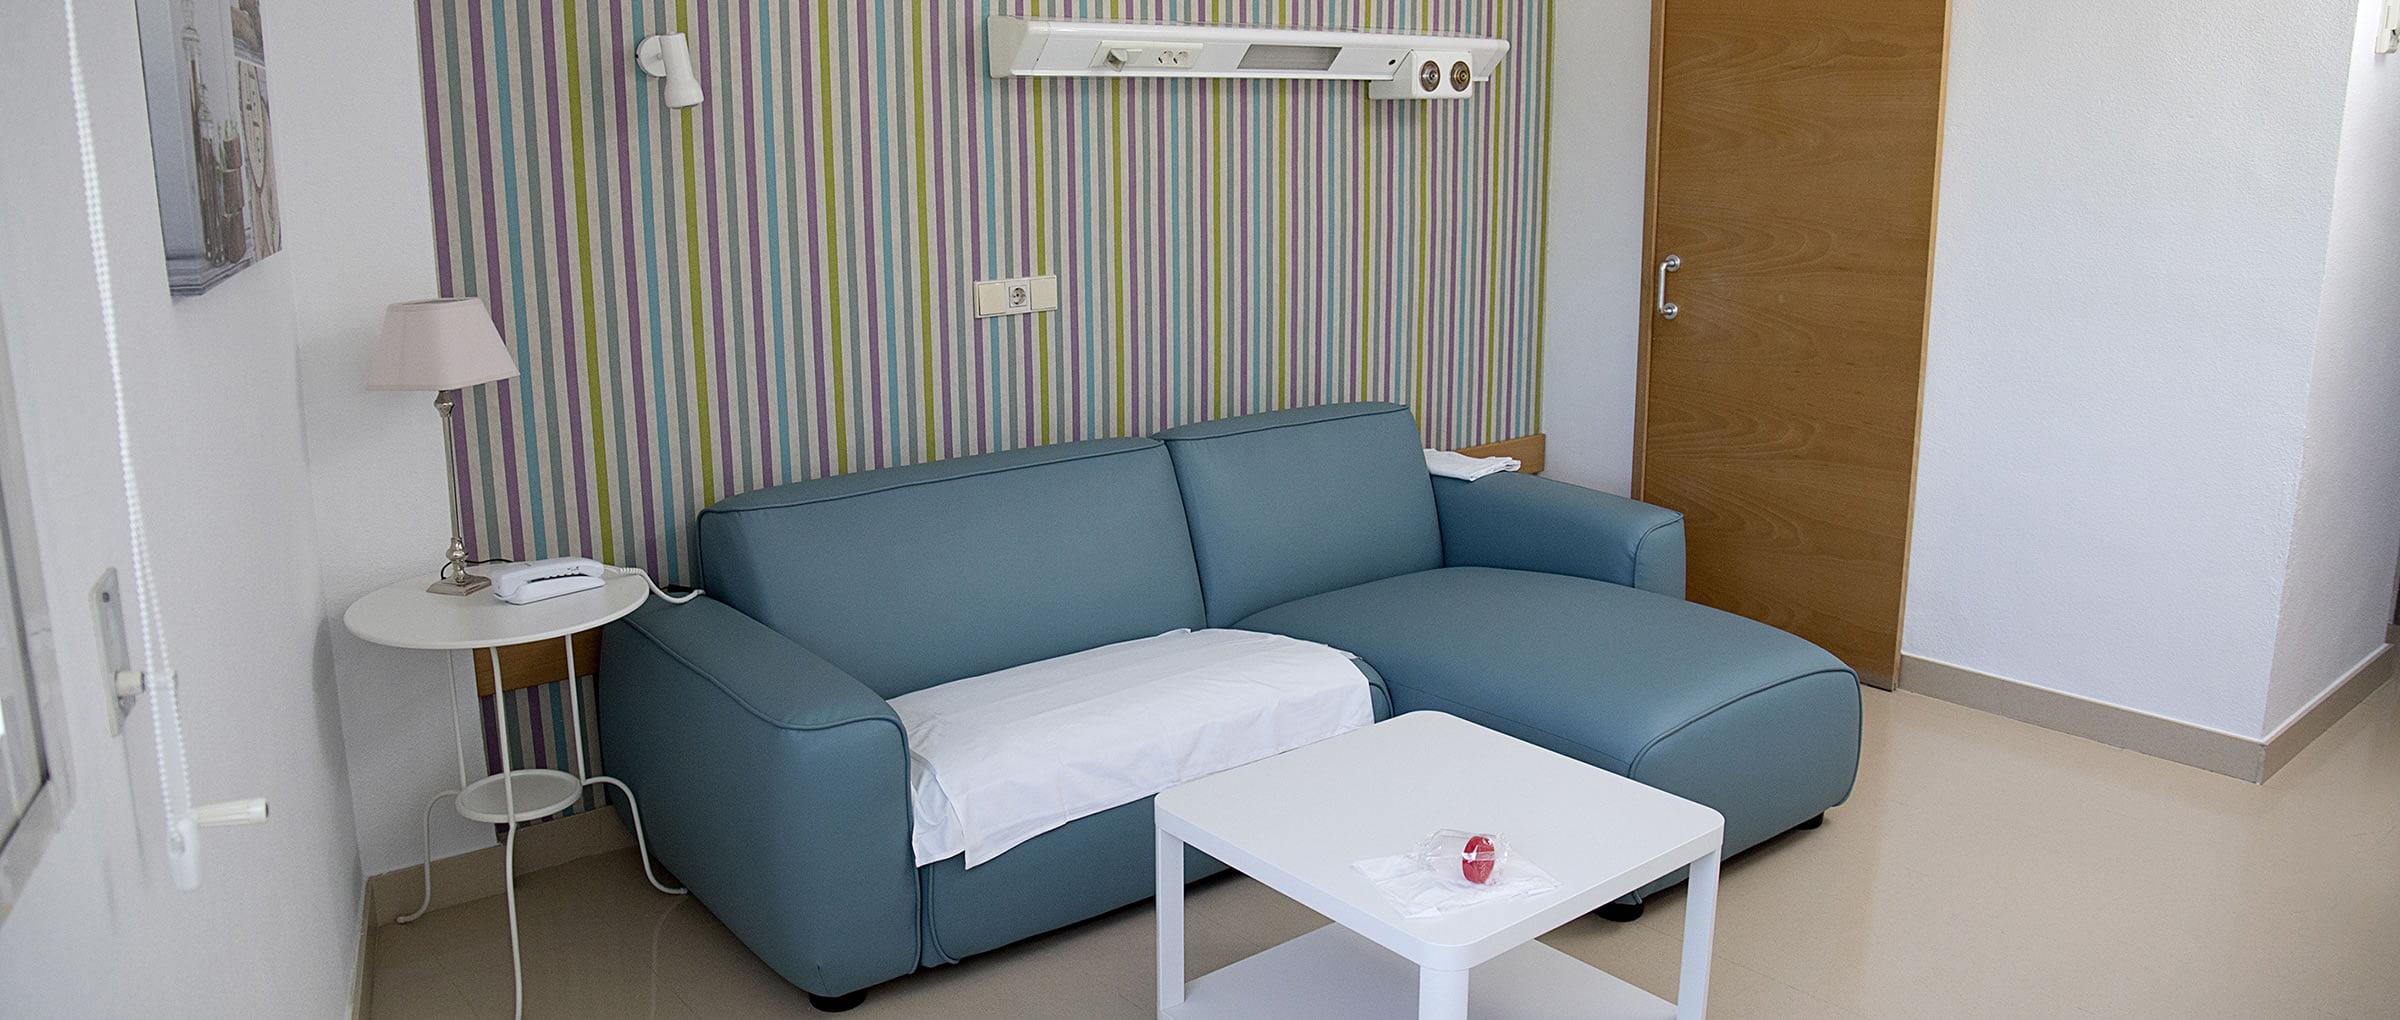 Unidad Phi Fertility Center area de espera